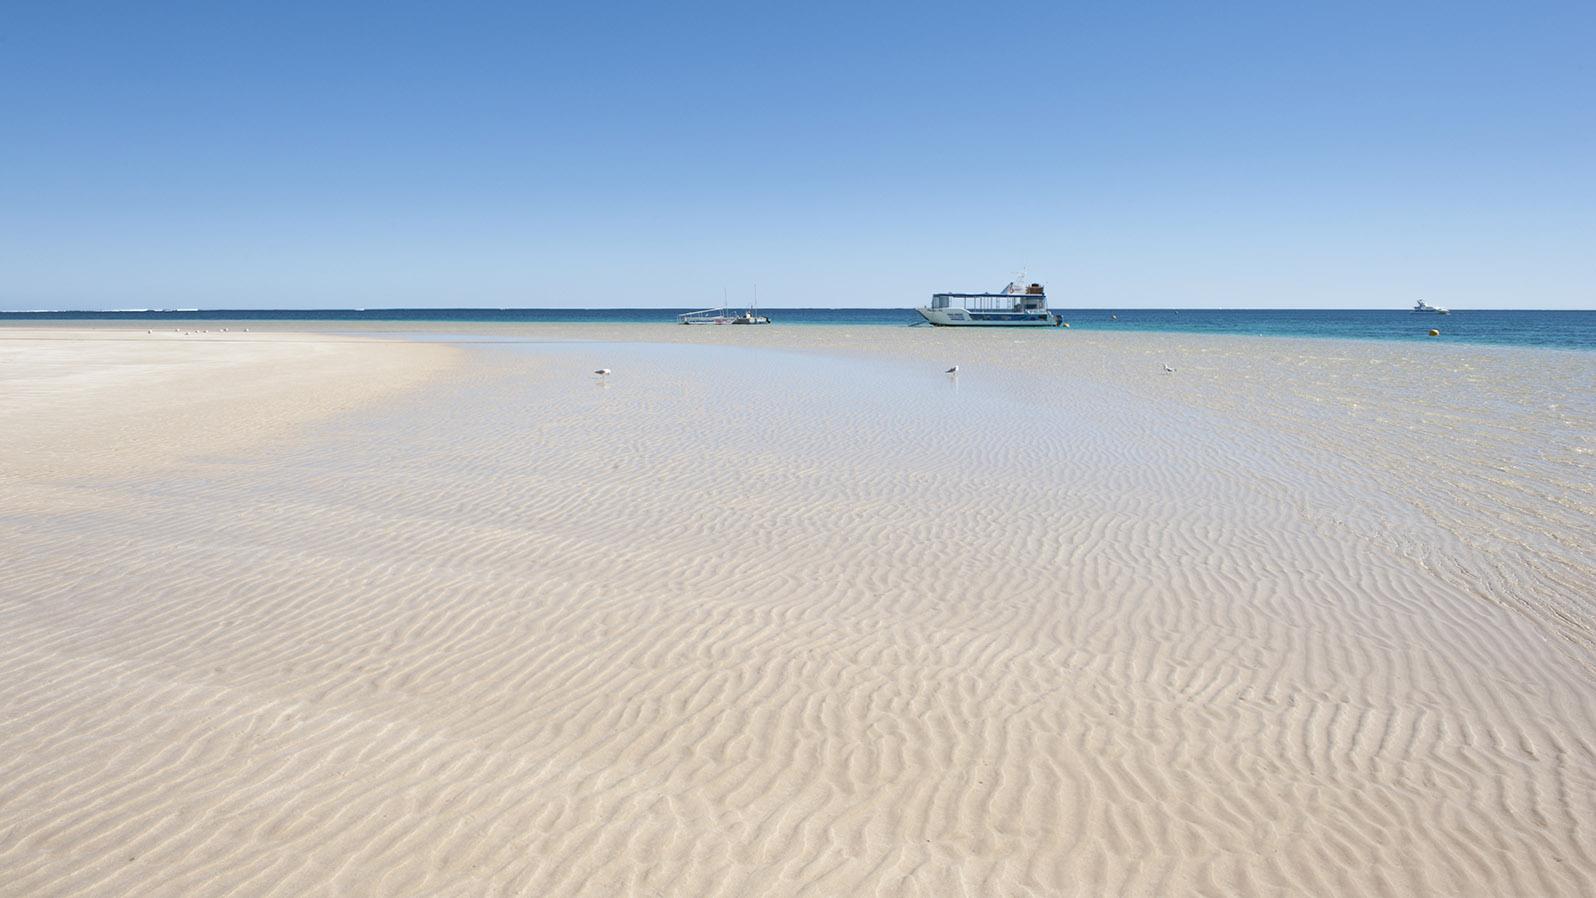 Coral Coast: Heller Sand, türkisblaues Meer und Korallengärten: Coral Bay. Foto: Hilke Maunder